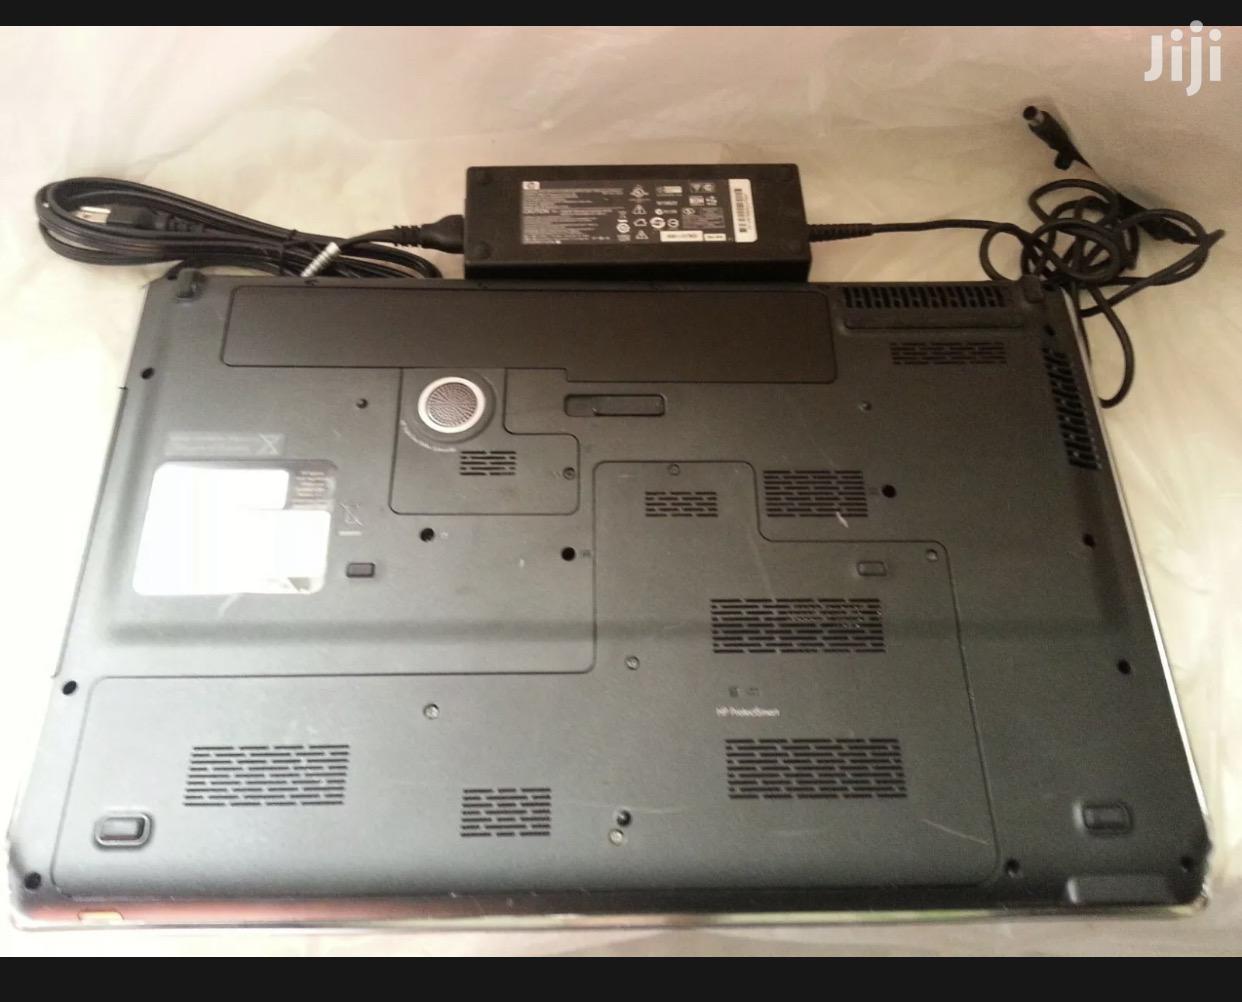 Laptop HP Pavilion Dv8T 4GB Intel Core i7 HDD 500GB | Laptops & Computers for sale in Kumasi Metropolitan, Ashanti, Ghana